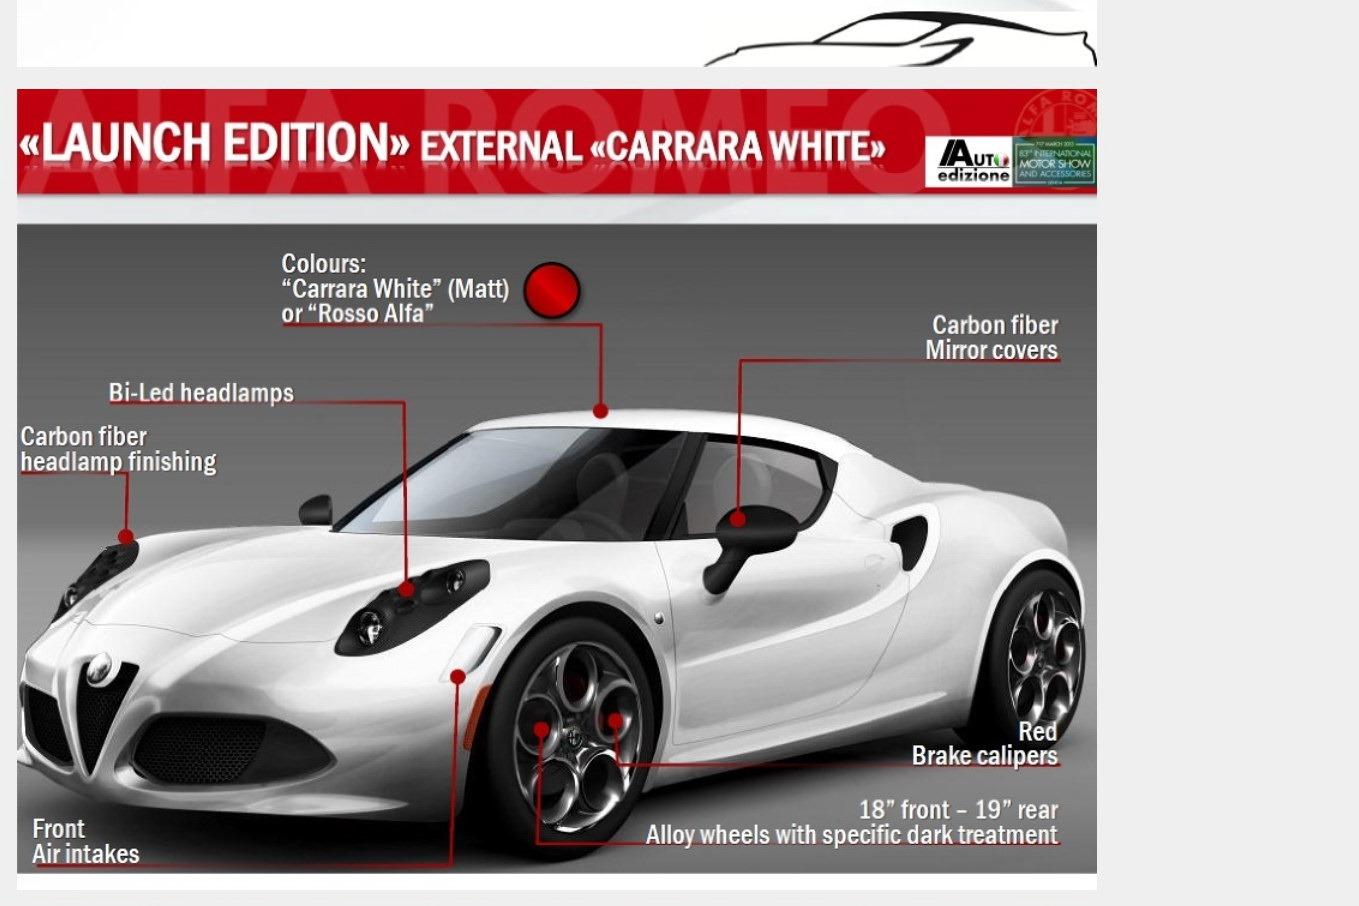 Alfa Romeo C Full Specs Revealed By Leaked Brochure